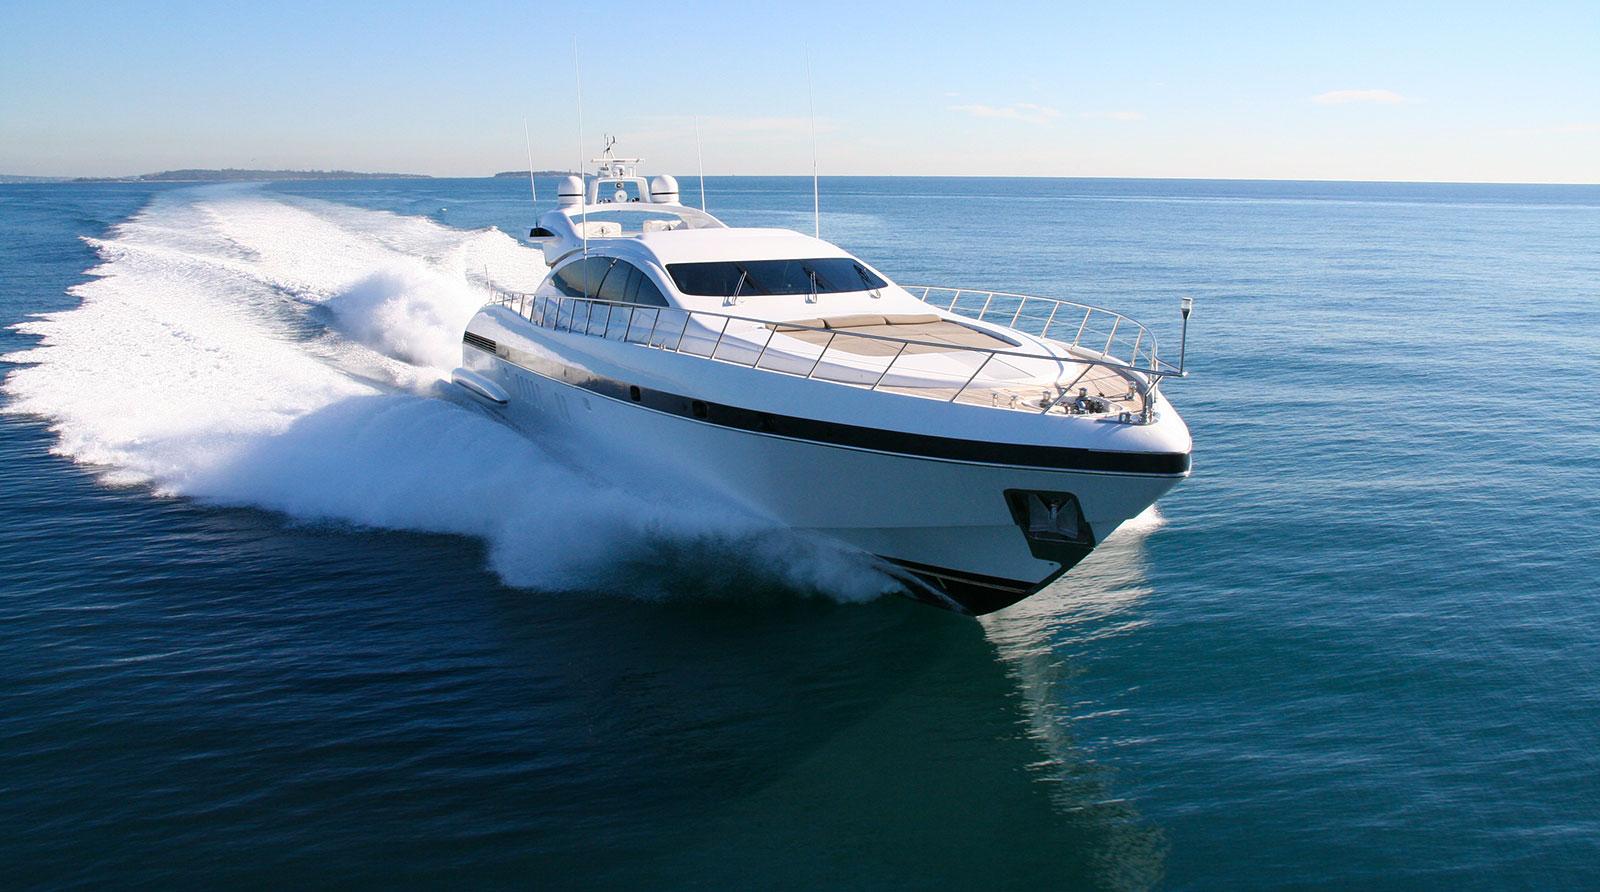 Motorboot-Charter-Mallorca-Motoryacht-Charter-Mallorca-2